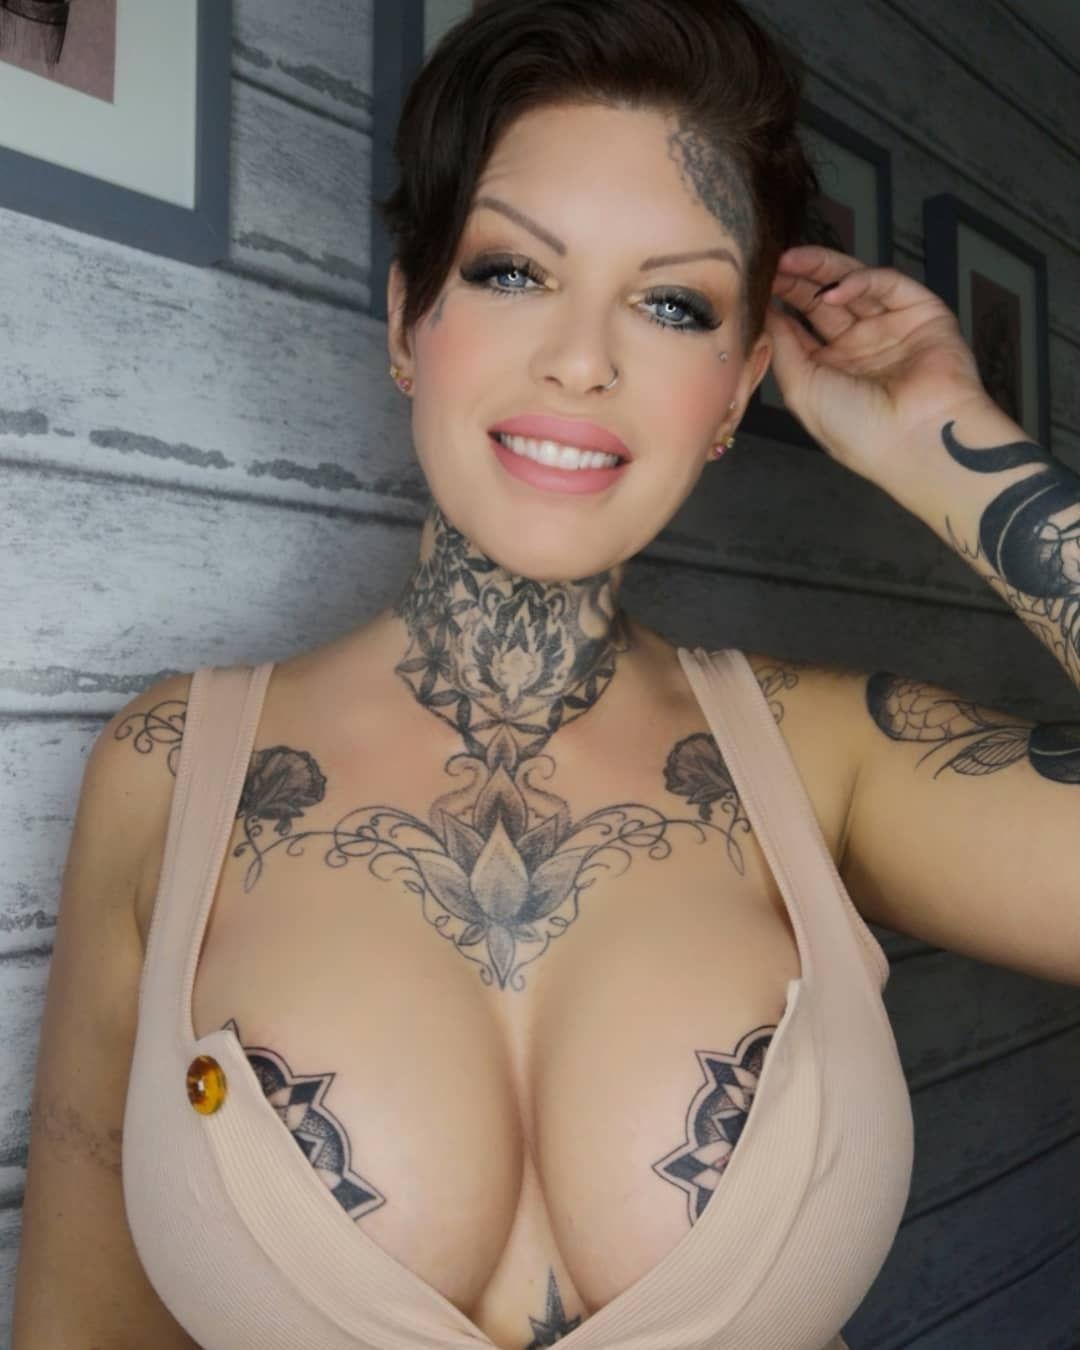 Pussy tattoos